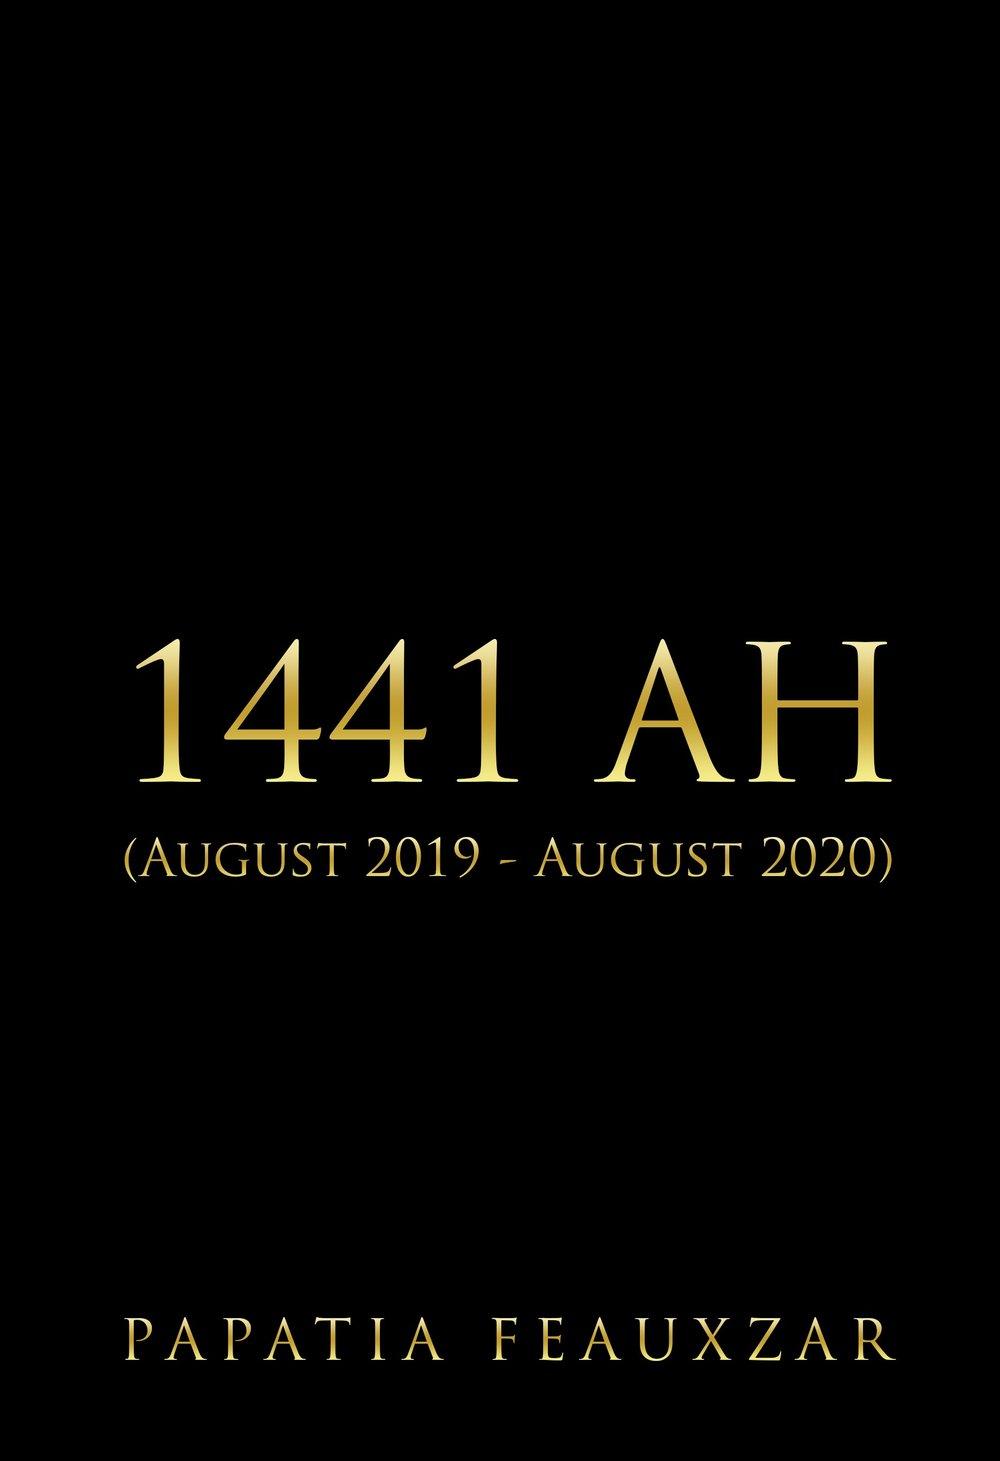 1441 AH half cover 1 8 19.jpg